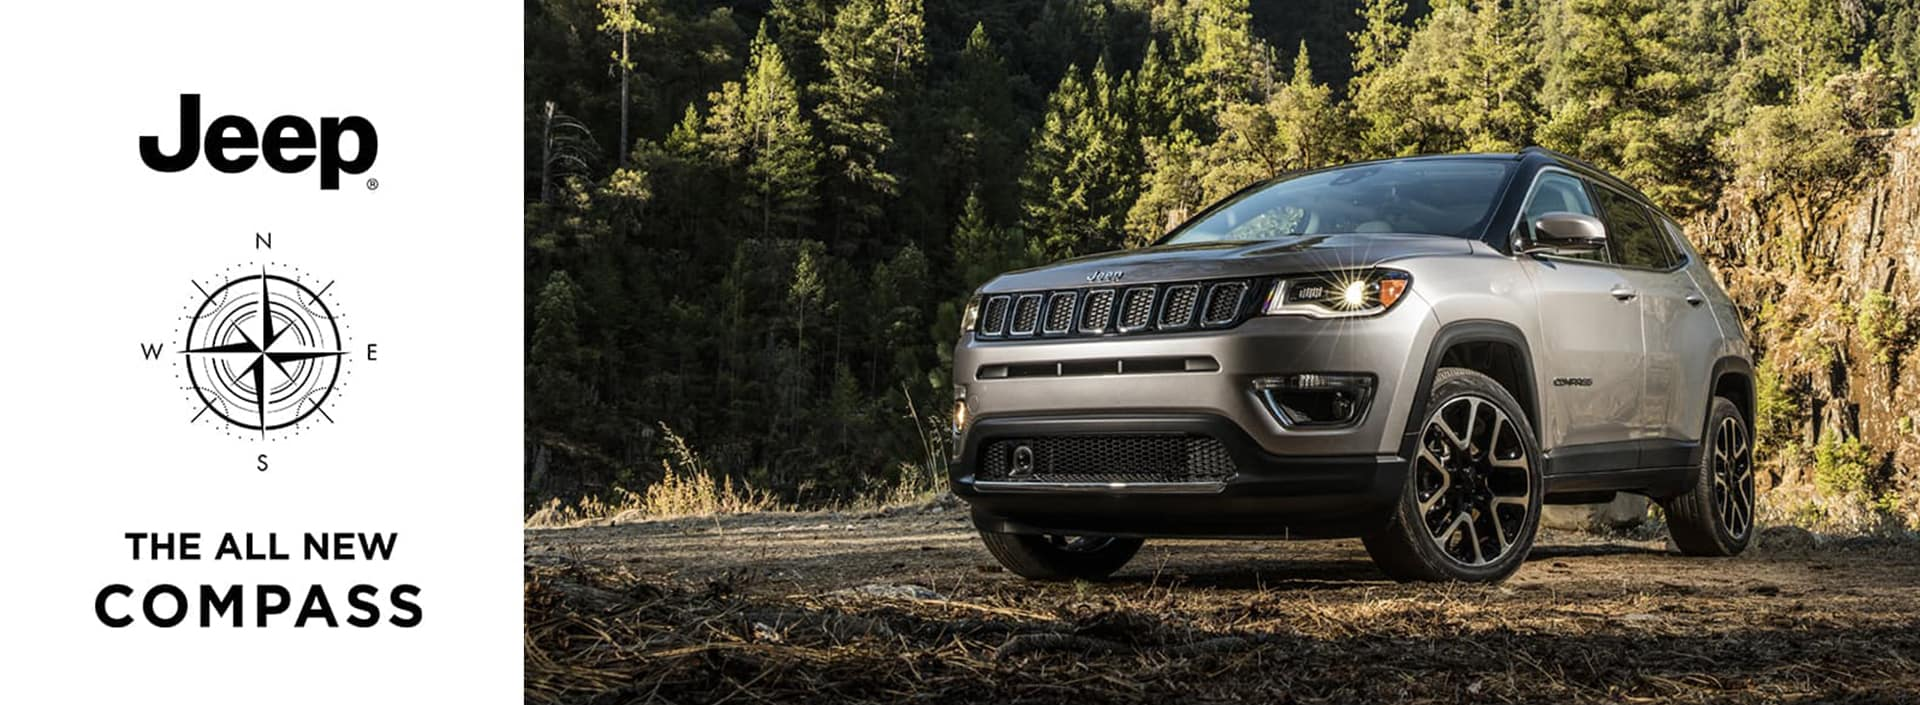 jeep-banner